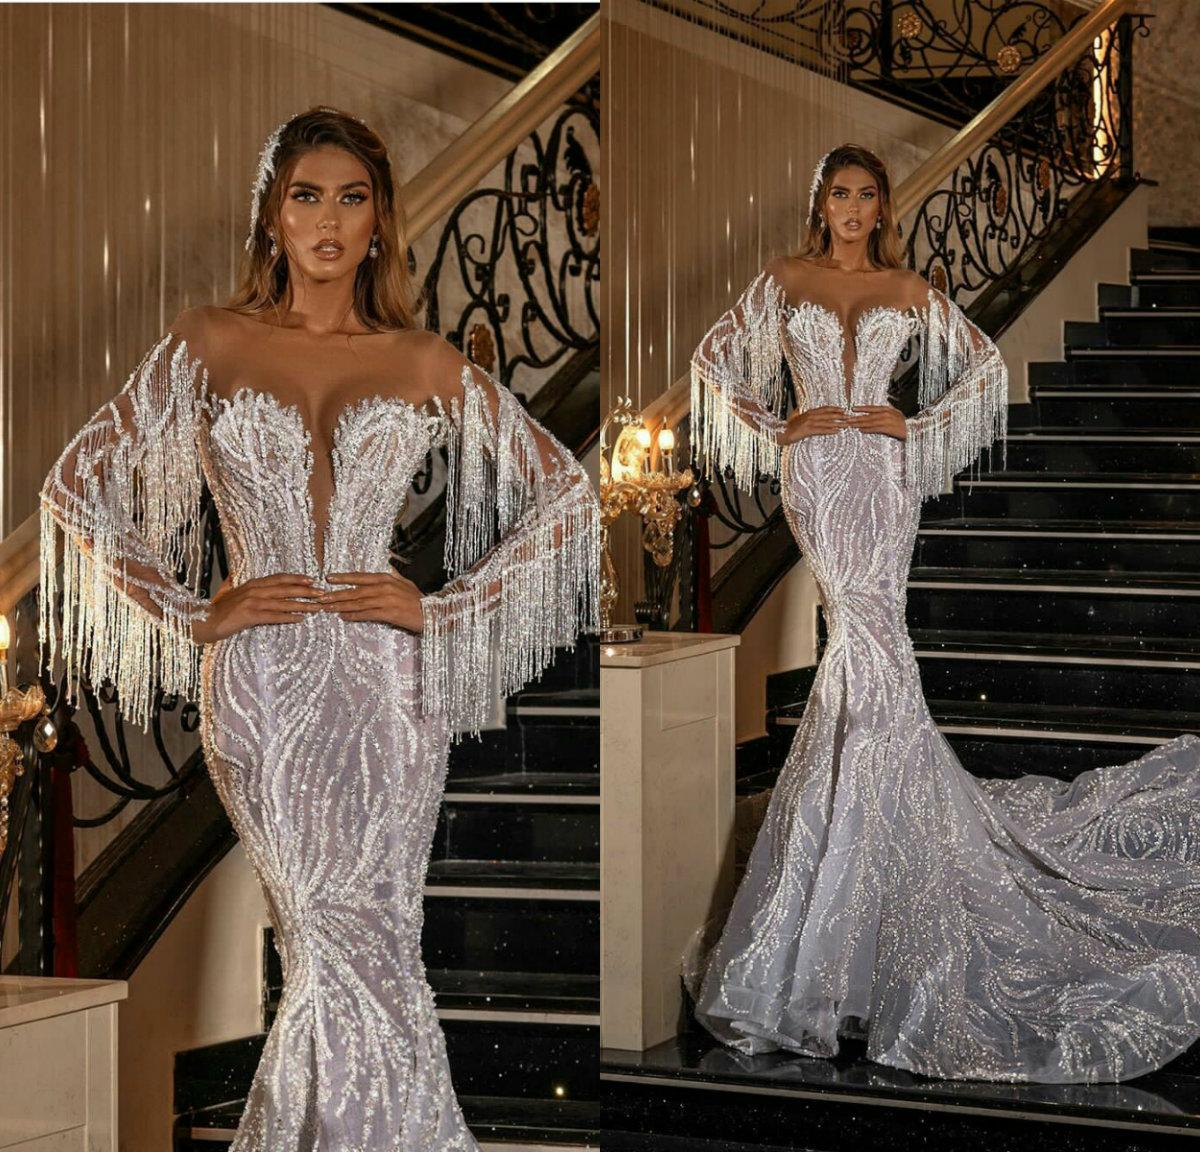 Sparkly South African Luxury Mermaid Wedding Dresses Beading Tassel Long Sleeve Bridal Gowns Vestido De Novia Sexy Illusion Sequins Wedding